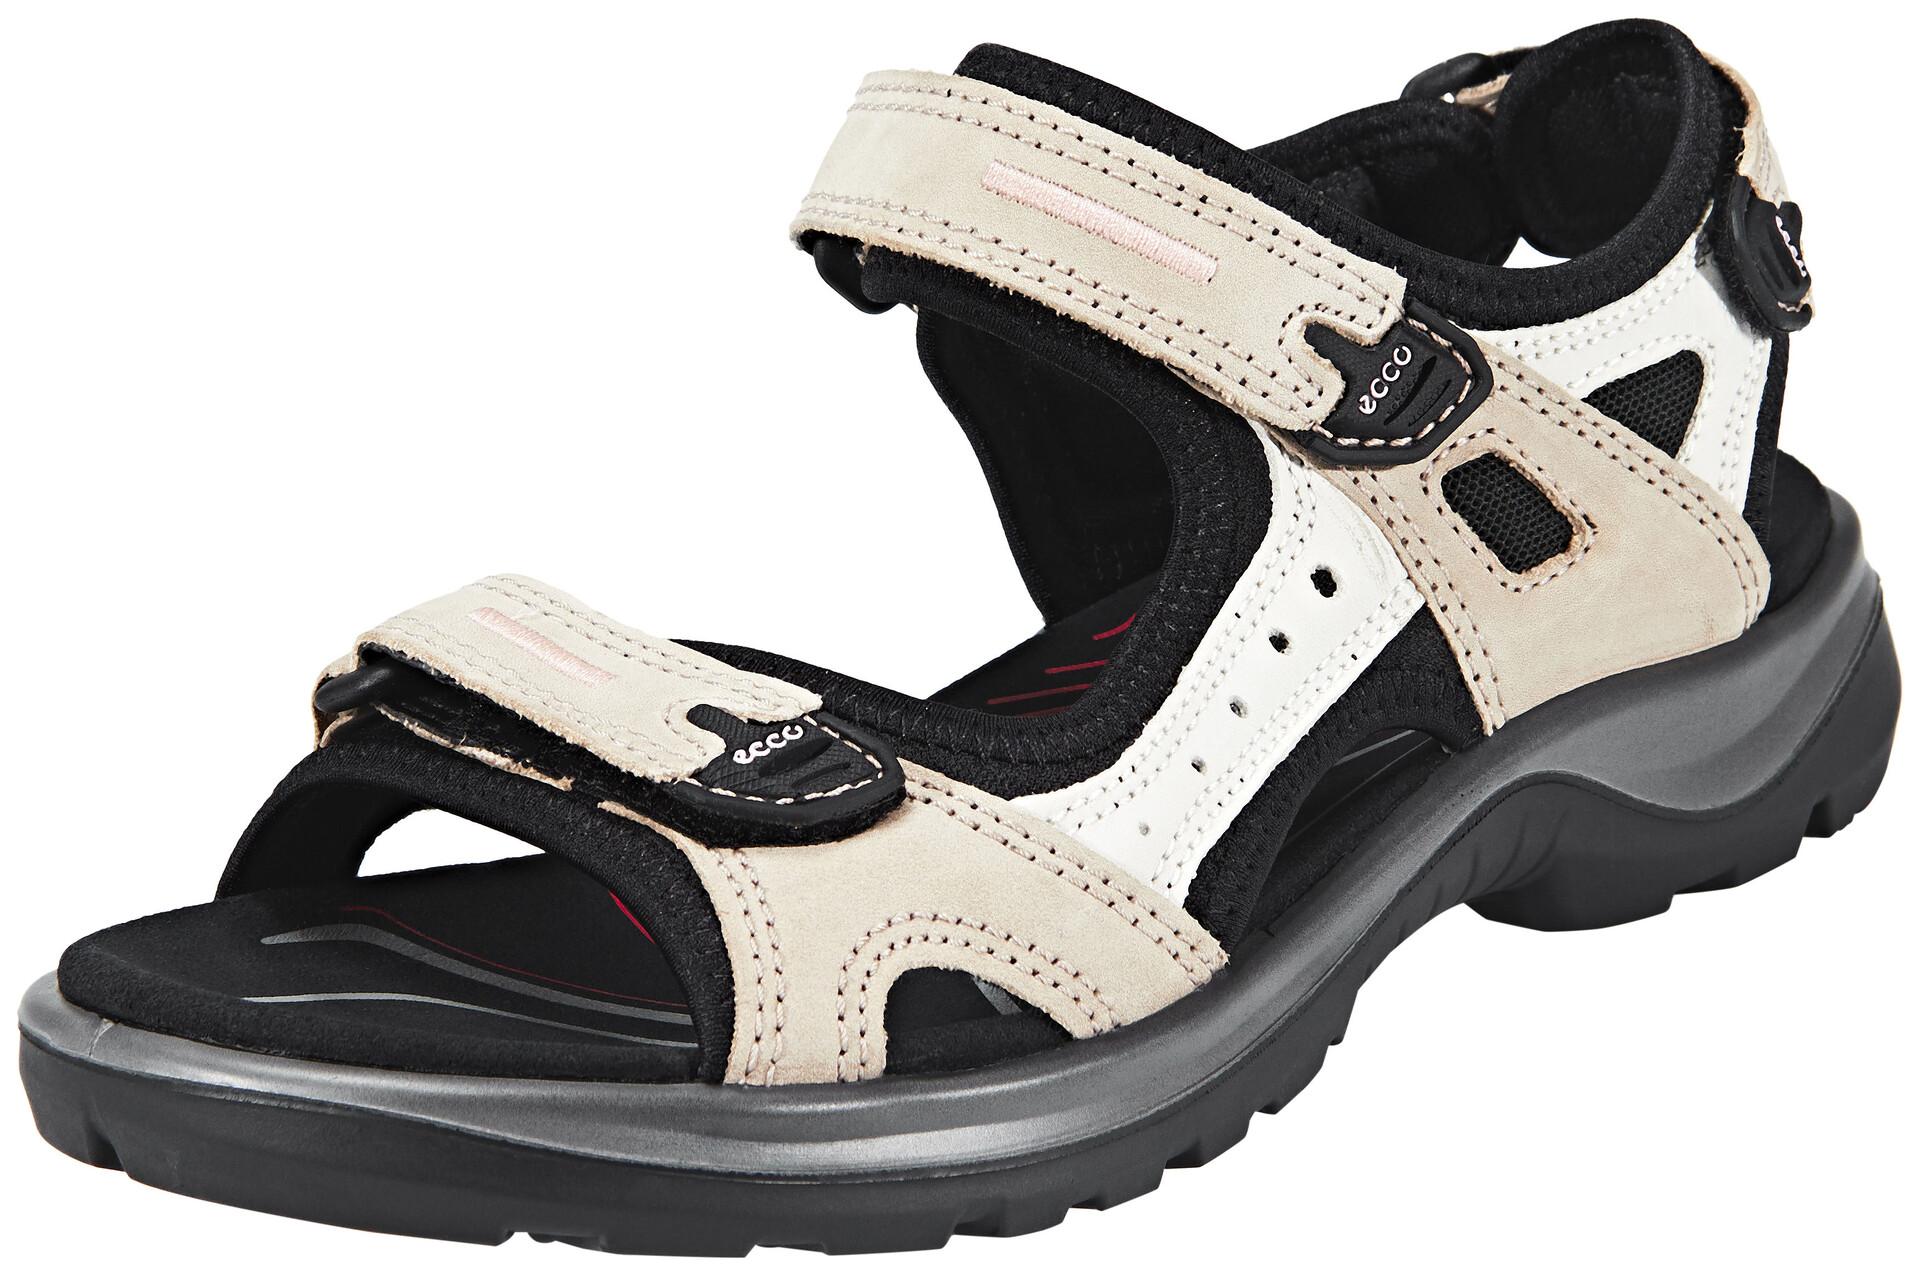 ECCO Offroad Chaussures Femme, atmosphereice whiteblack